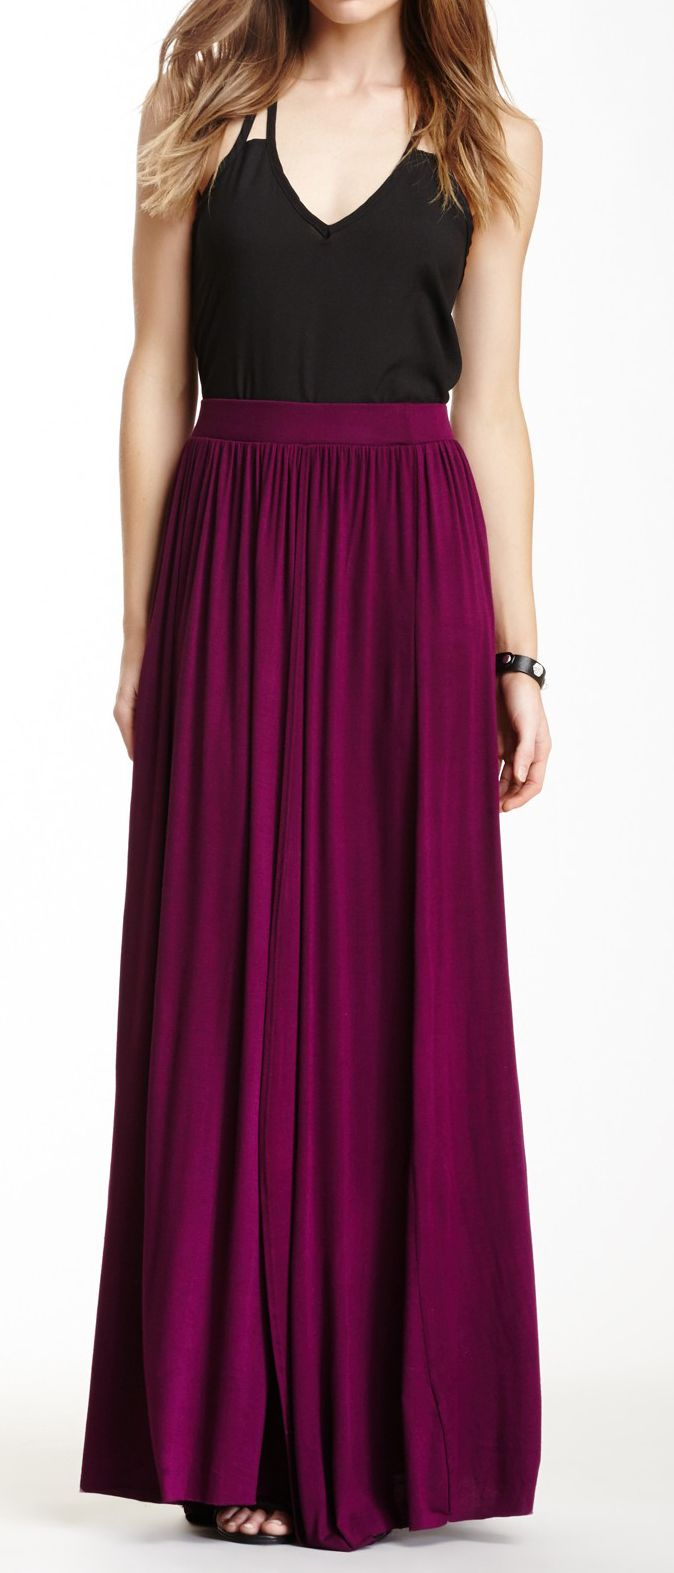 1000  images about MODA - SAIAS on Pinterest   Linen skirt, Maxi ...